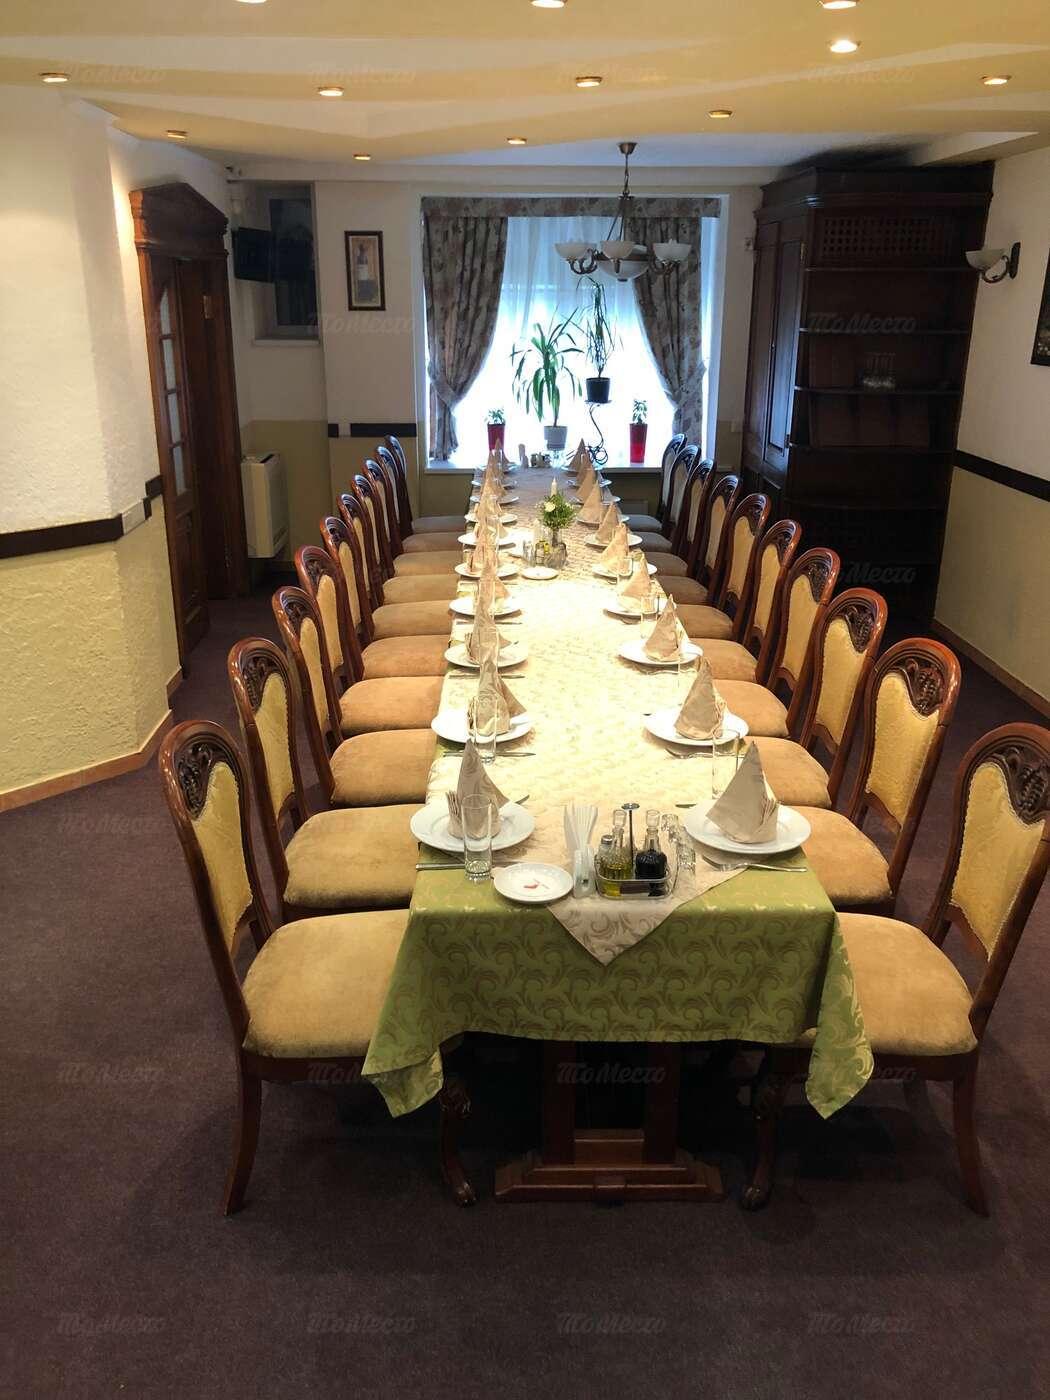 Ресторан Балканский Гурман на Декабристов фото 13